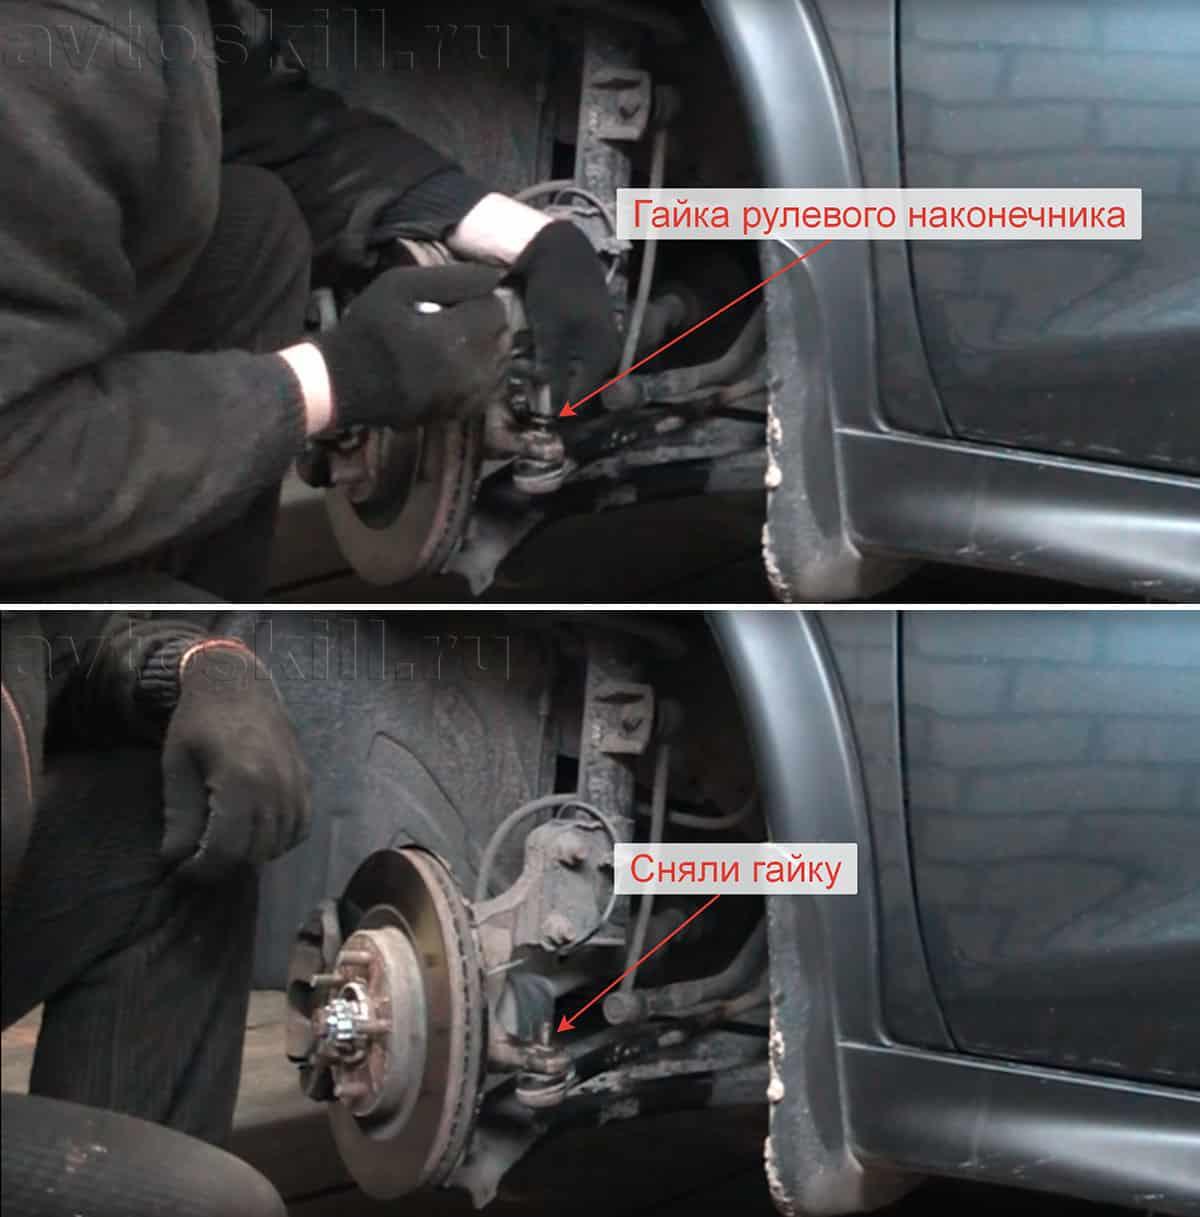 Как снять рулевой наконечник без съемника